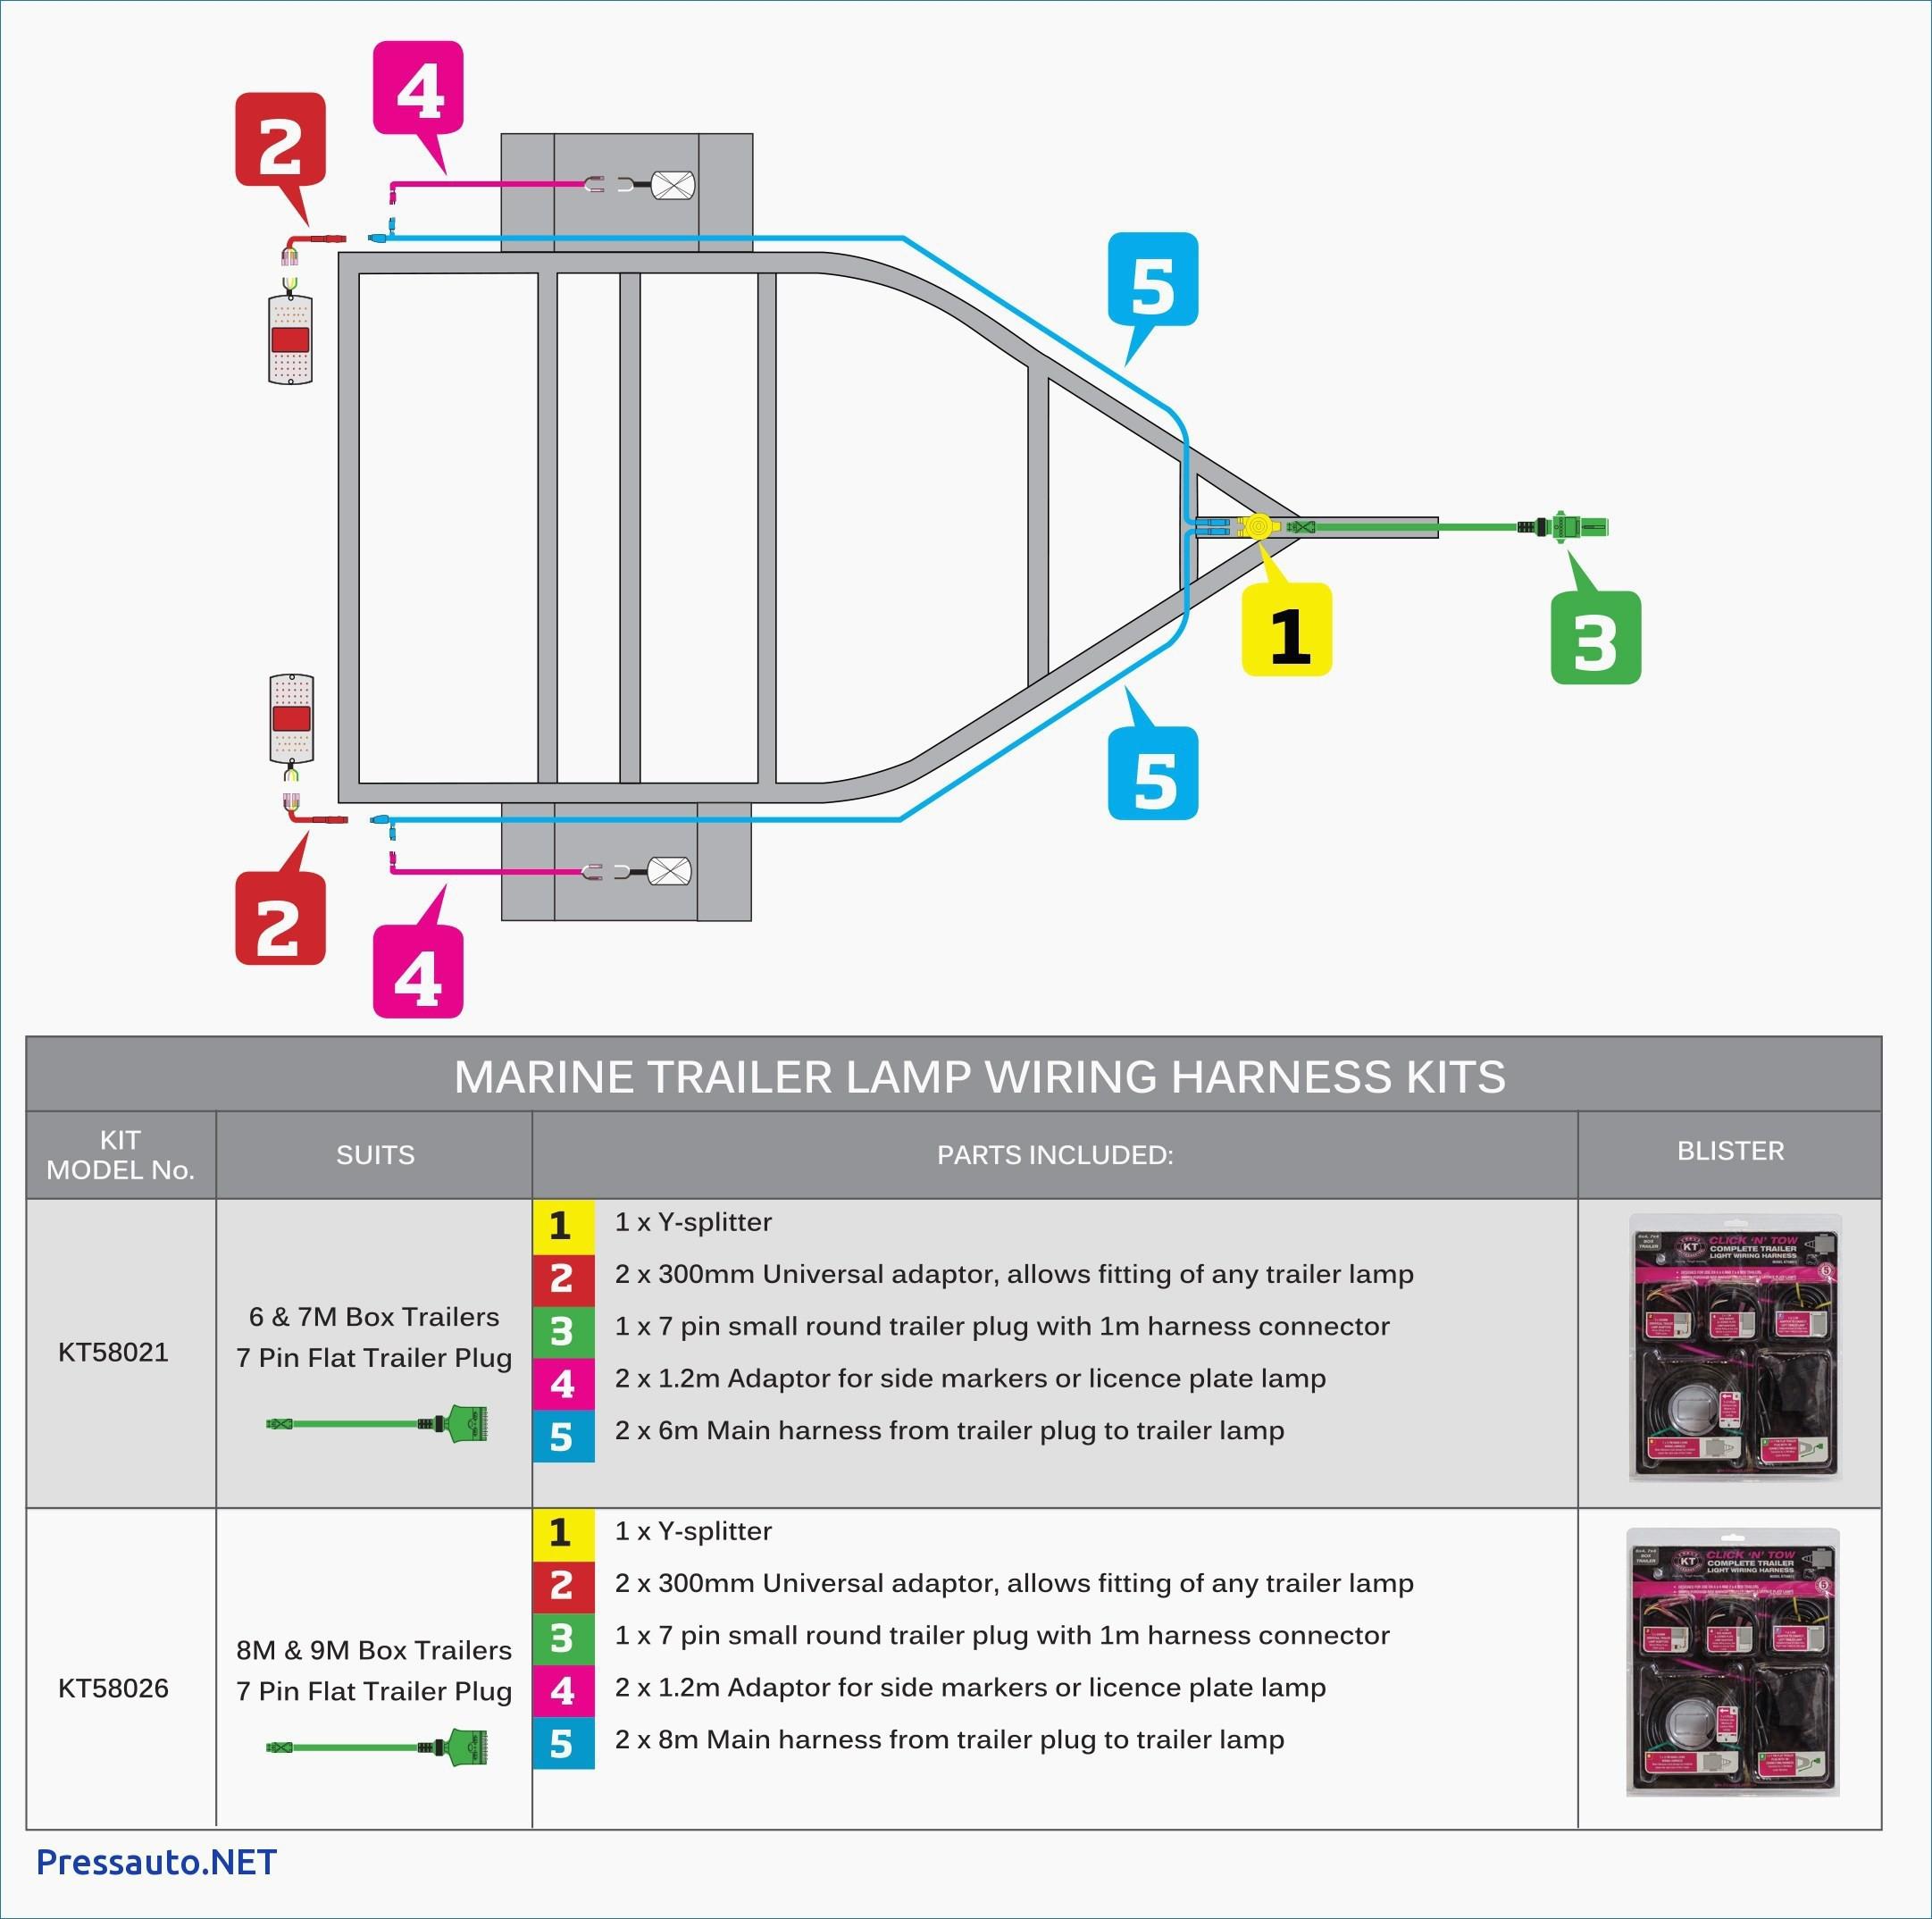 Six Pin Wiring Diagram - All Diagram Schematics Ranger Boat Trailer Wiring Diagram Pin on